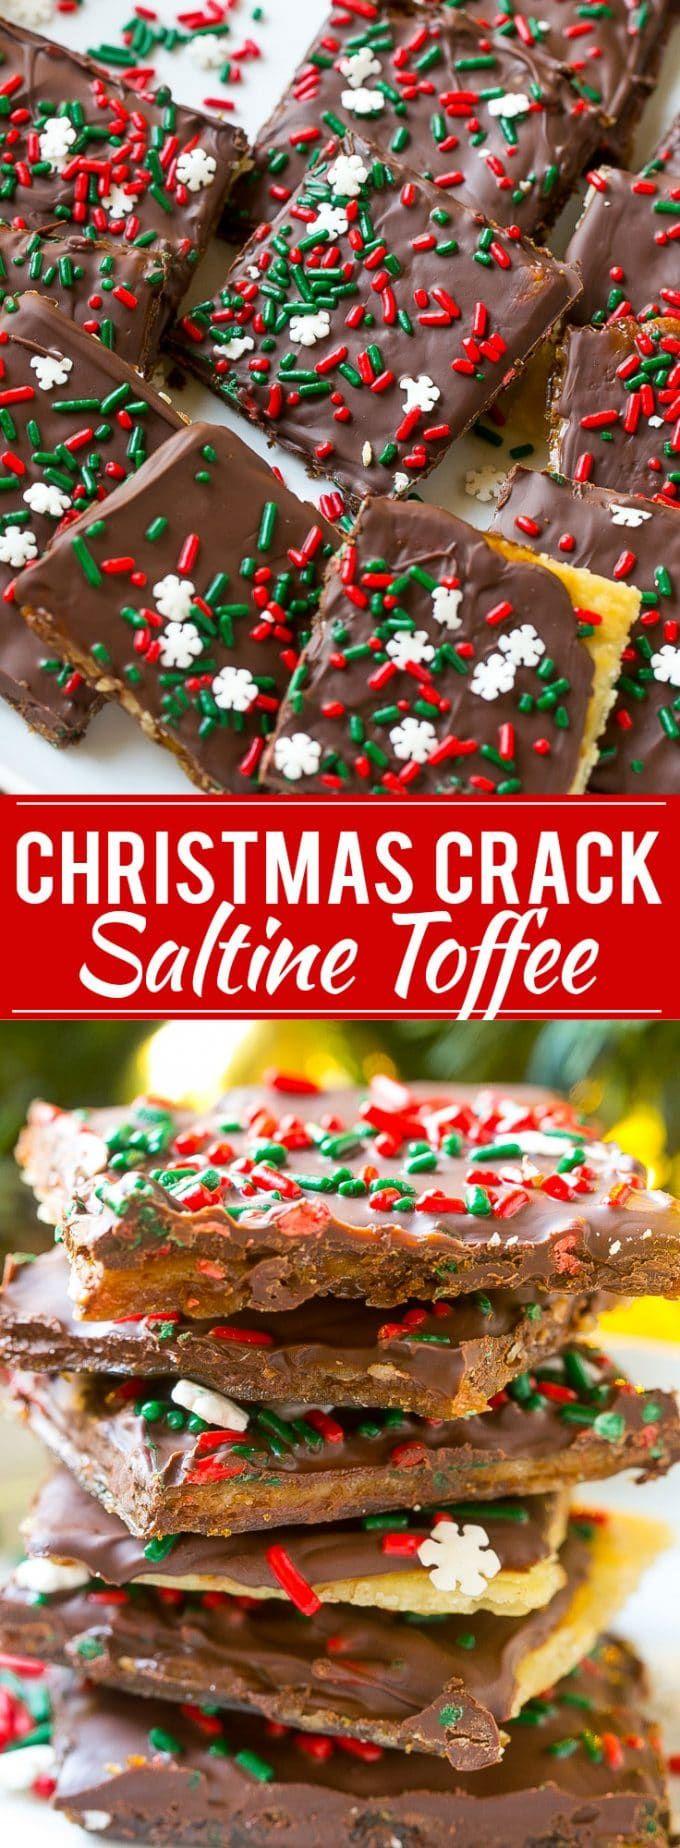 Christmas Crack Recipe | Saltine Toffee Recipe | Toffee Recipe | Christmas Toffee | Chocolate Toffee | Easy Dessert Recipe | Easy Candy Recipe | Homemade Toffee